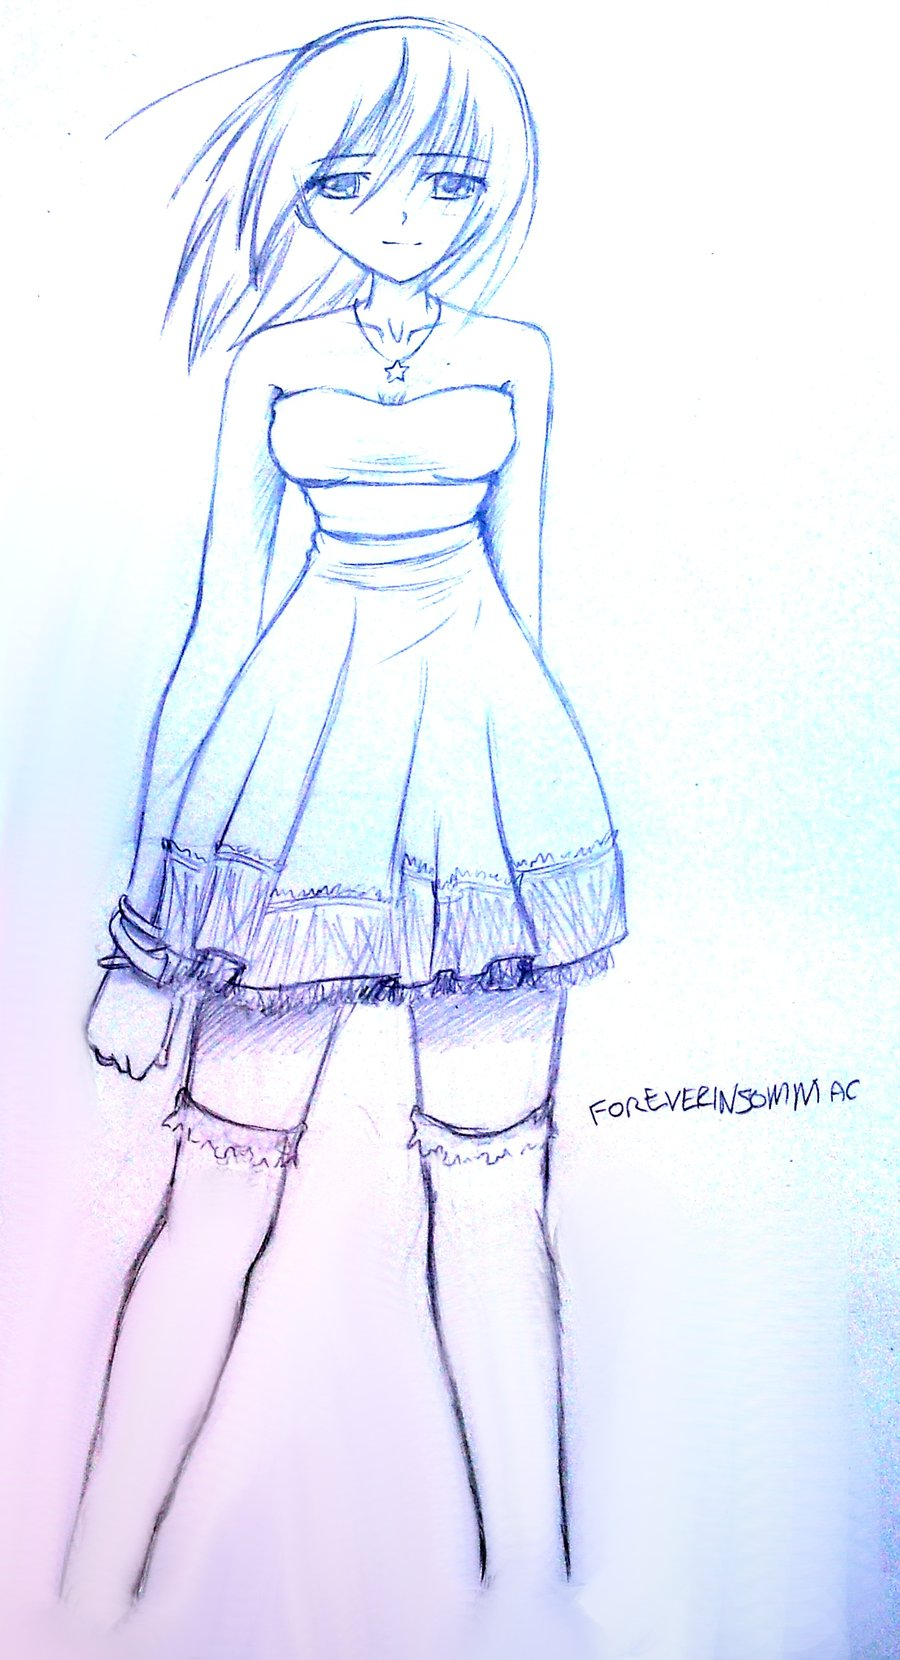 900x1660 Girl In Dress Sketch By Fishingforcats